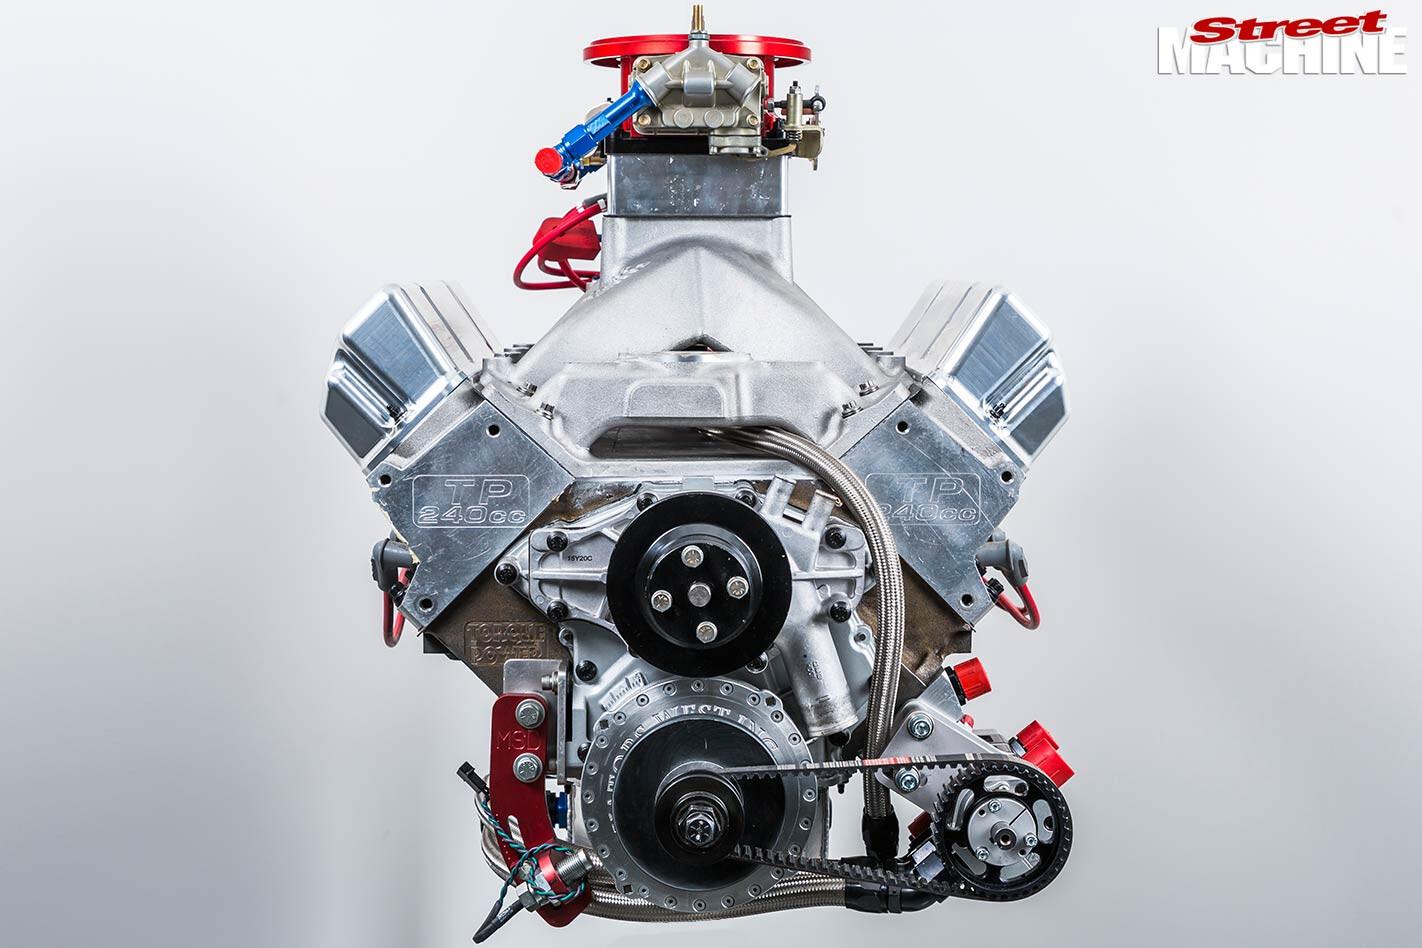 holden engine front